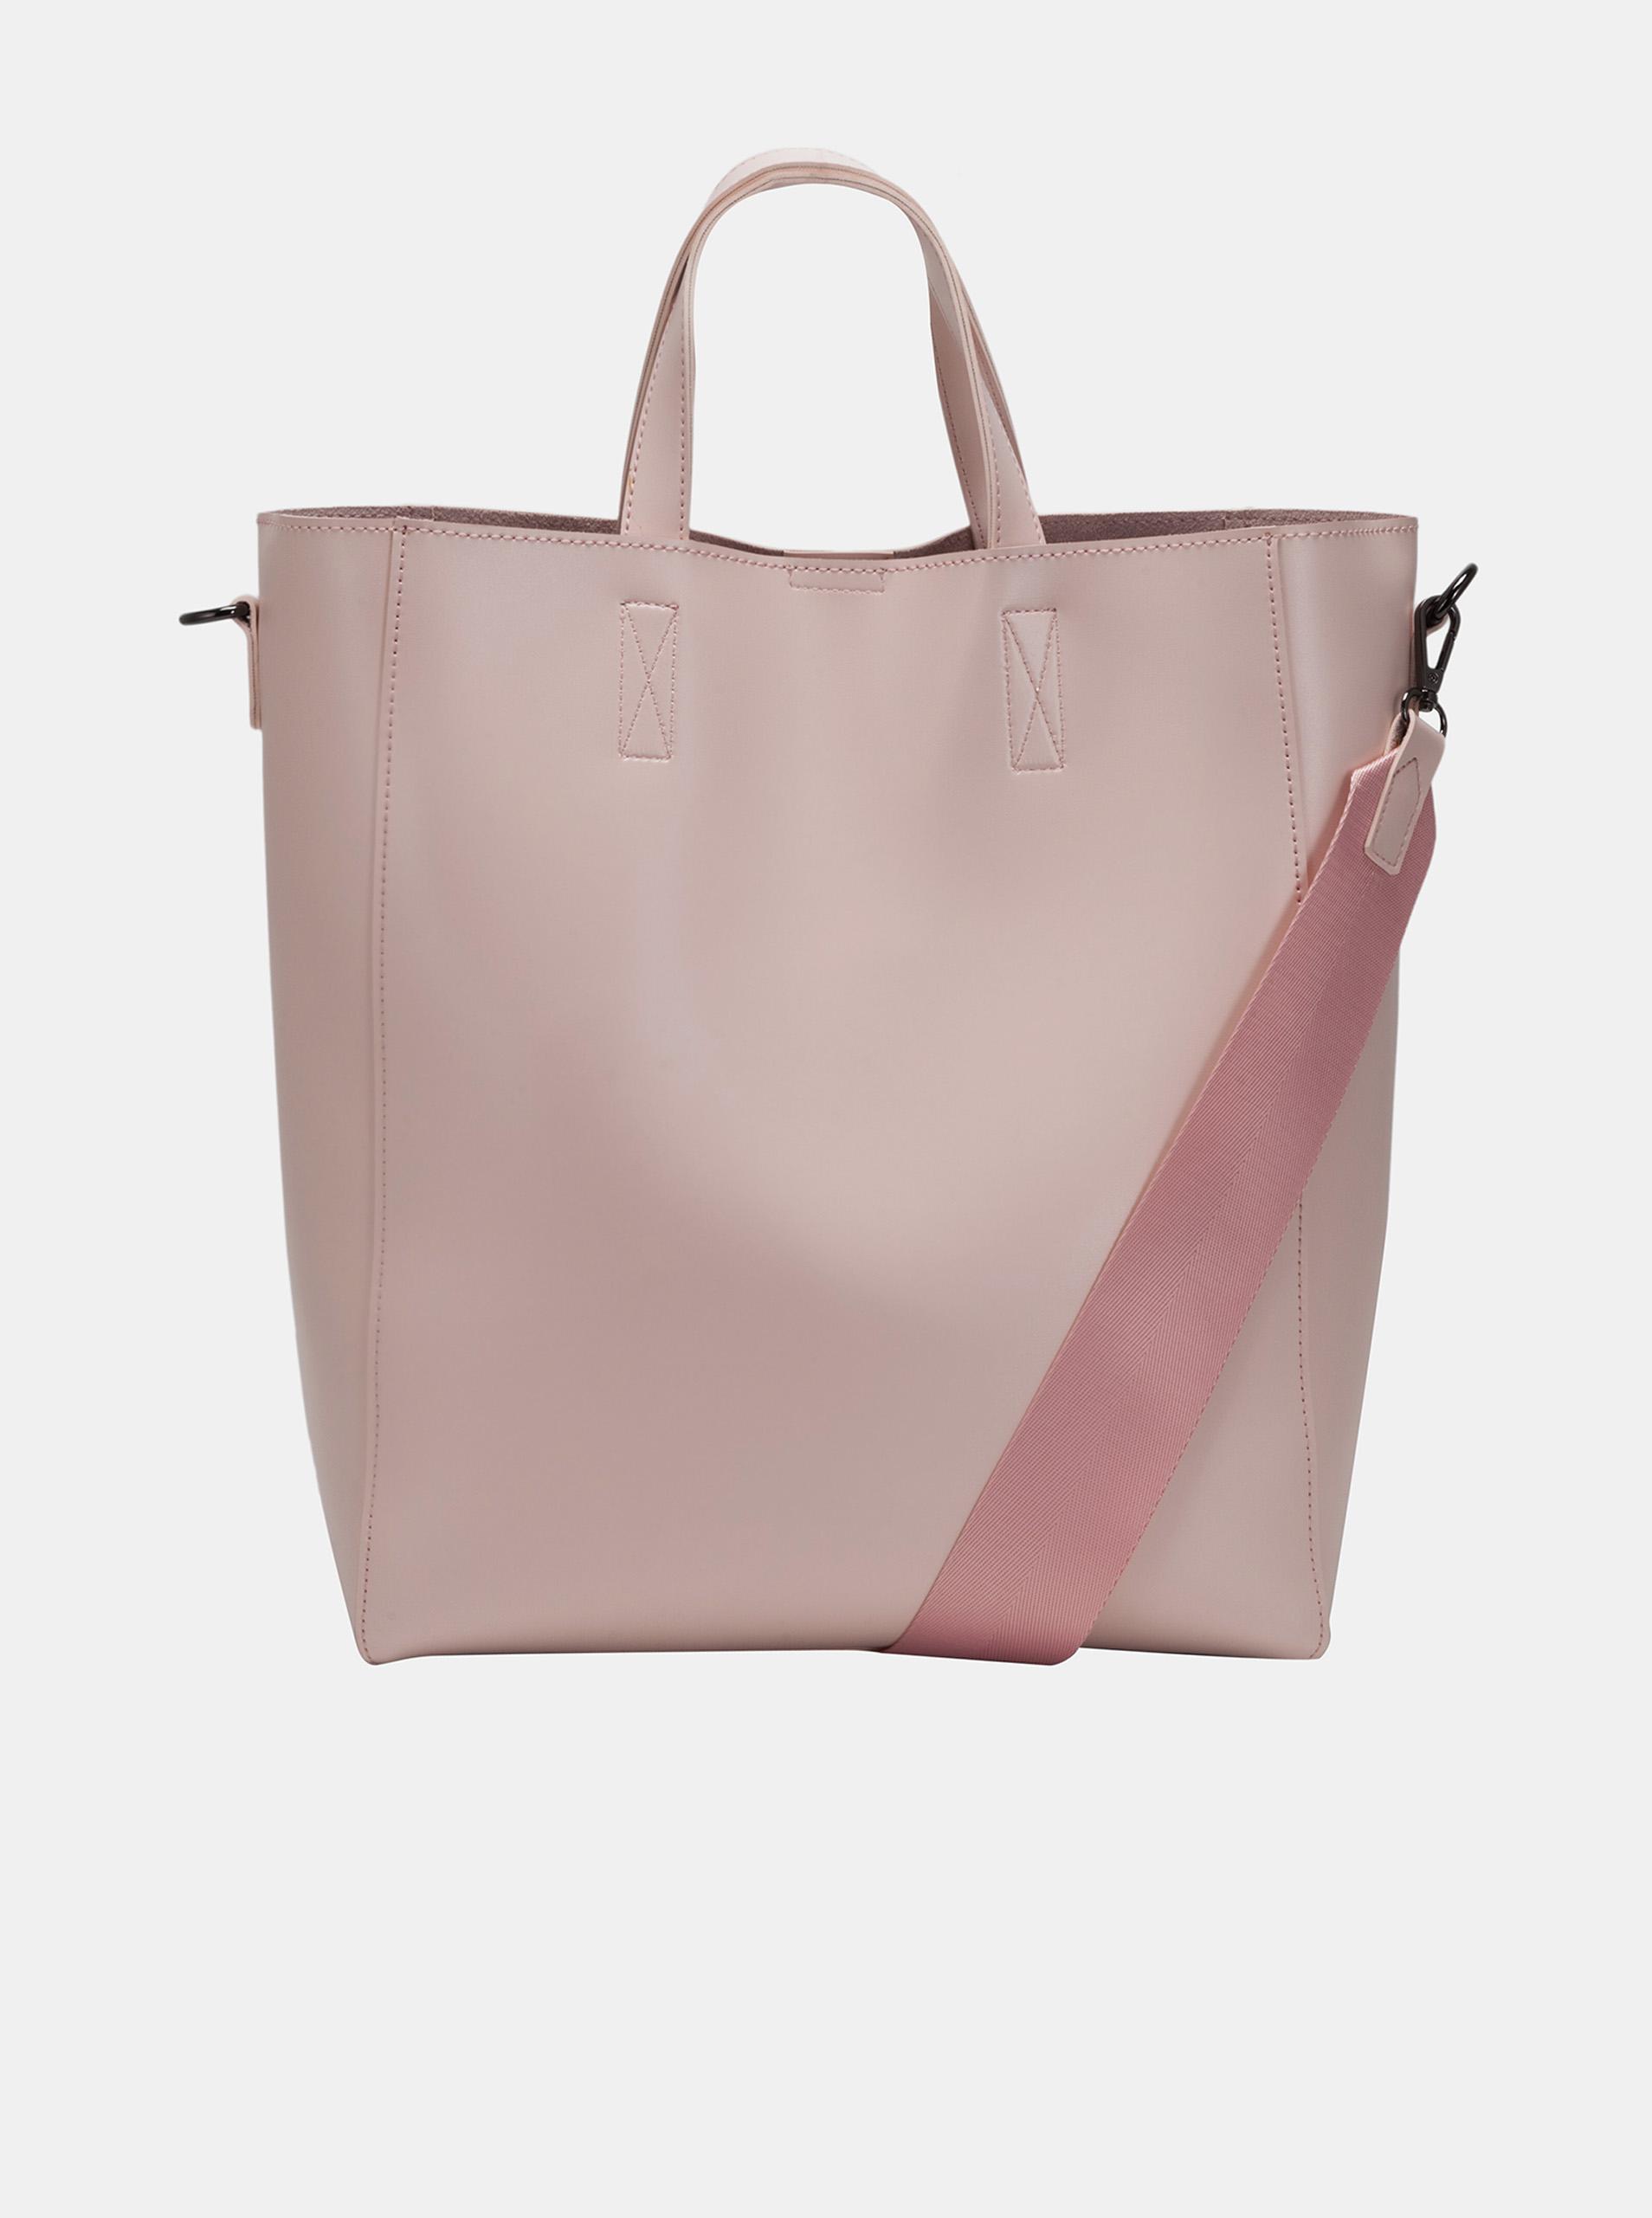 Claudia Canova roz mare geanta